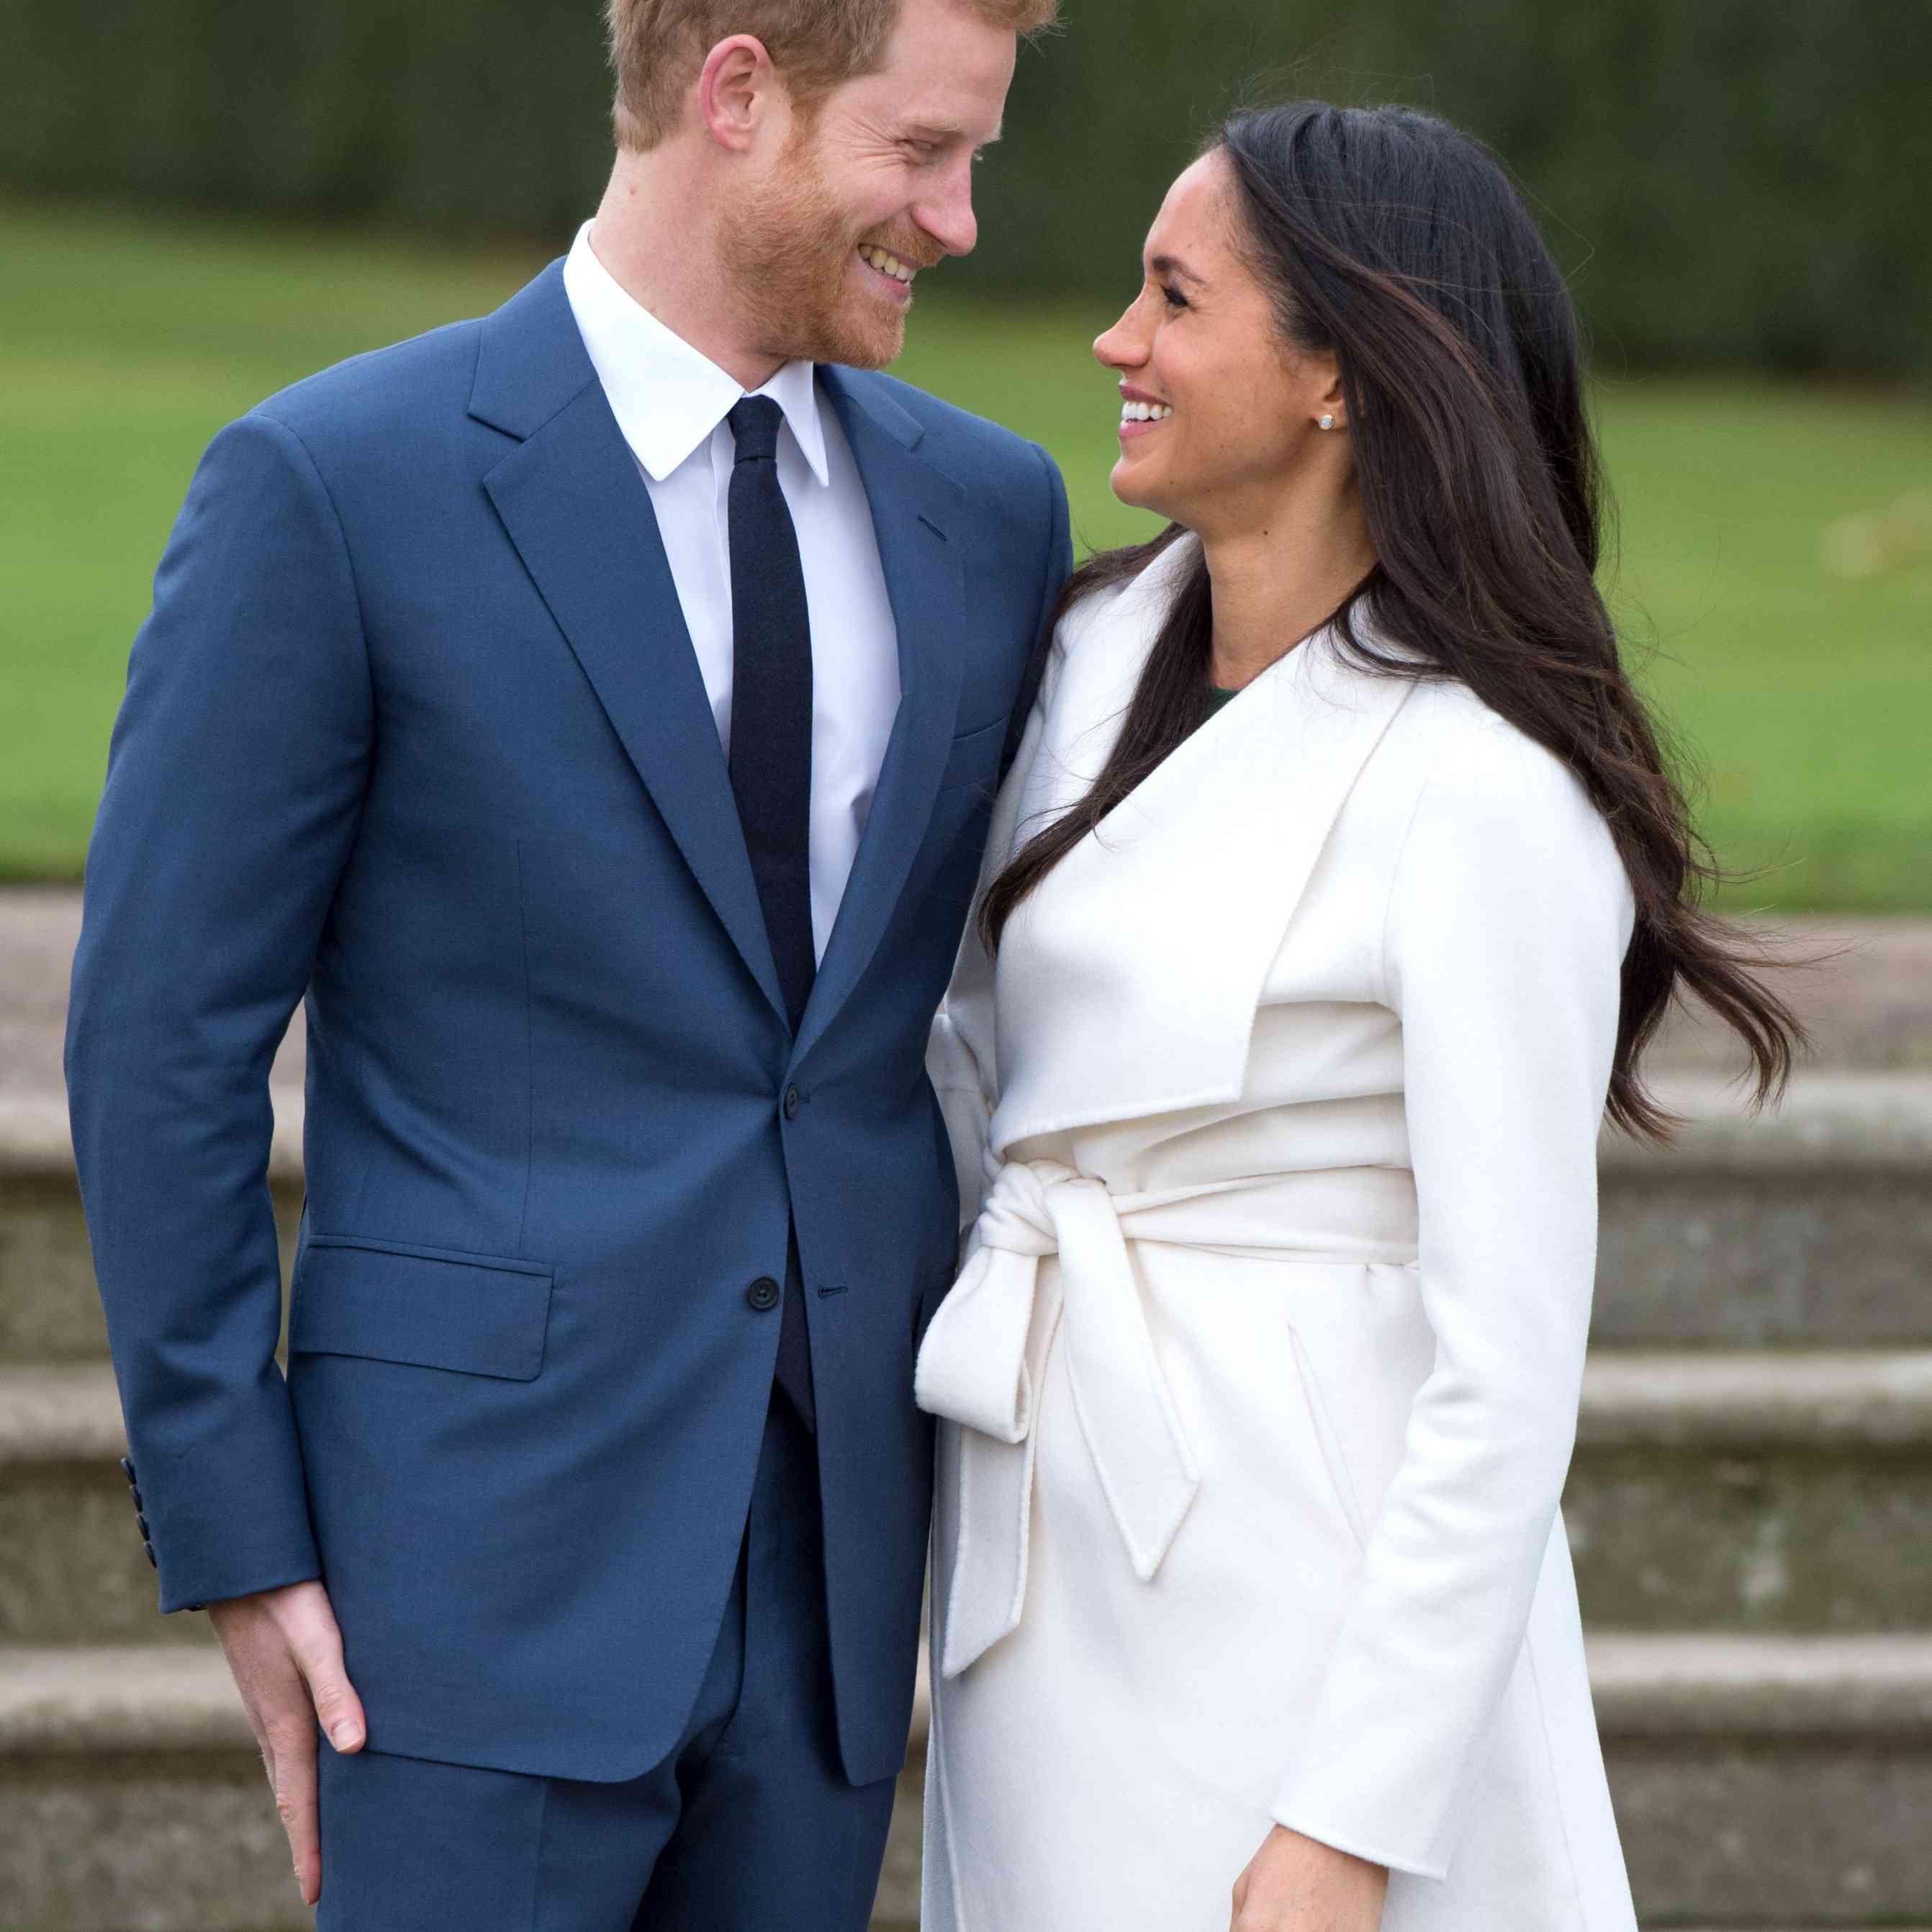 Prince Harry and Meghan Markl